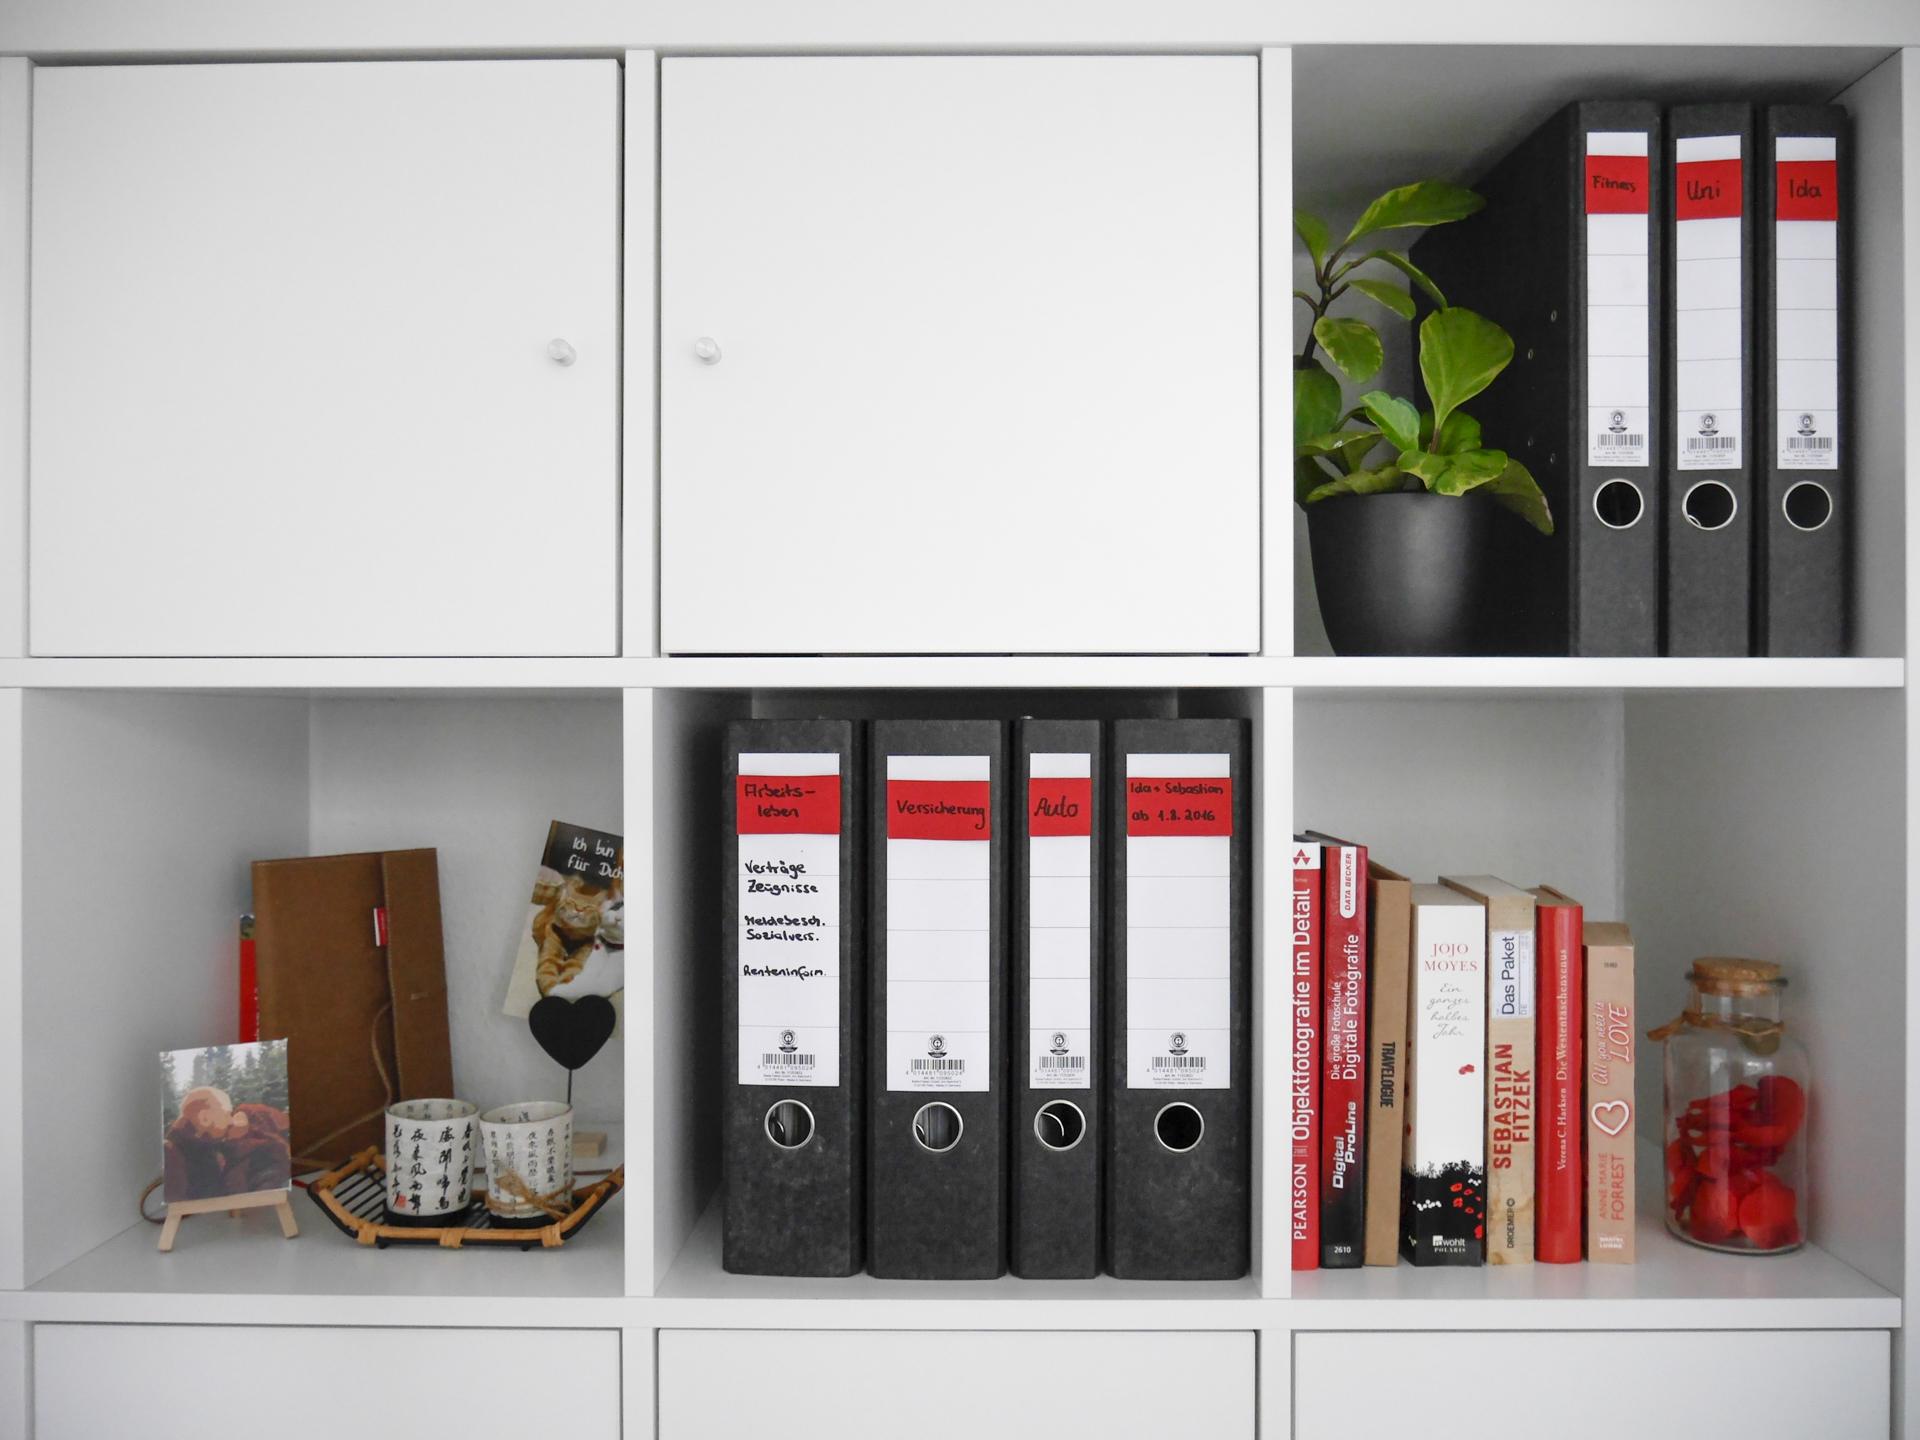 beautiful ikea regale kallax einrichtungsideen images home design ideas. Black Bedroom Furniture Sets. Home Design Ideas